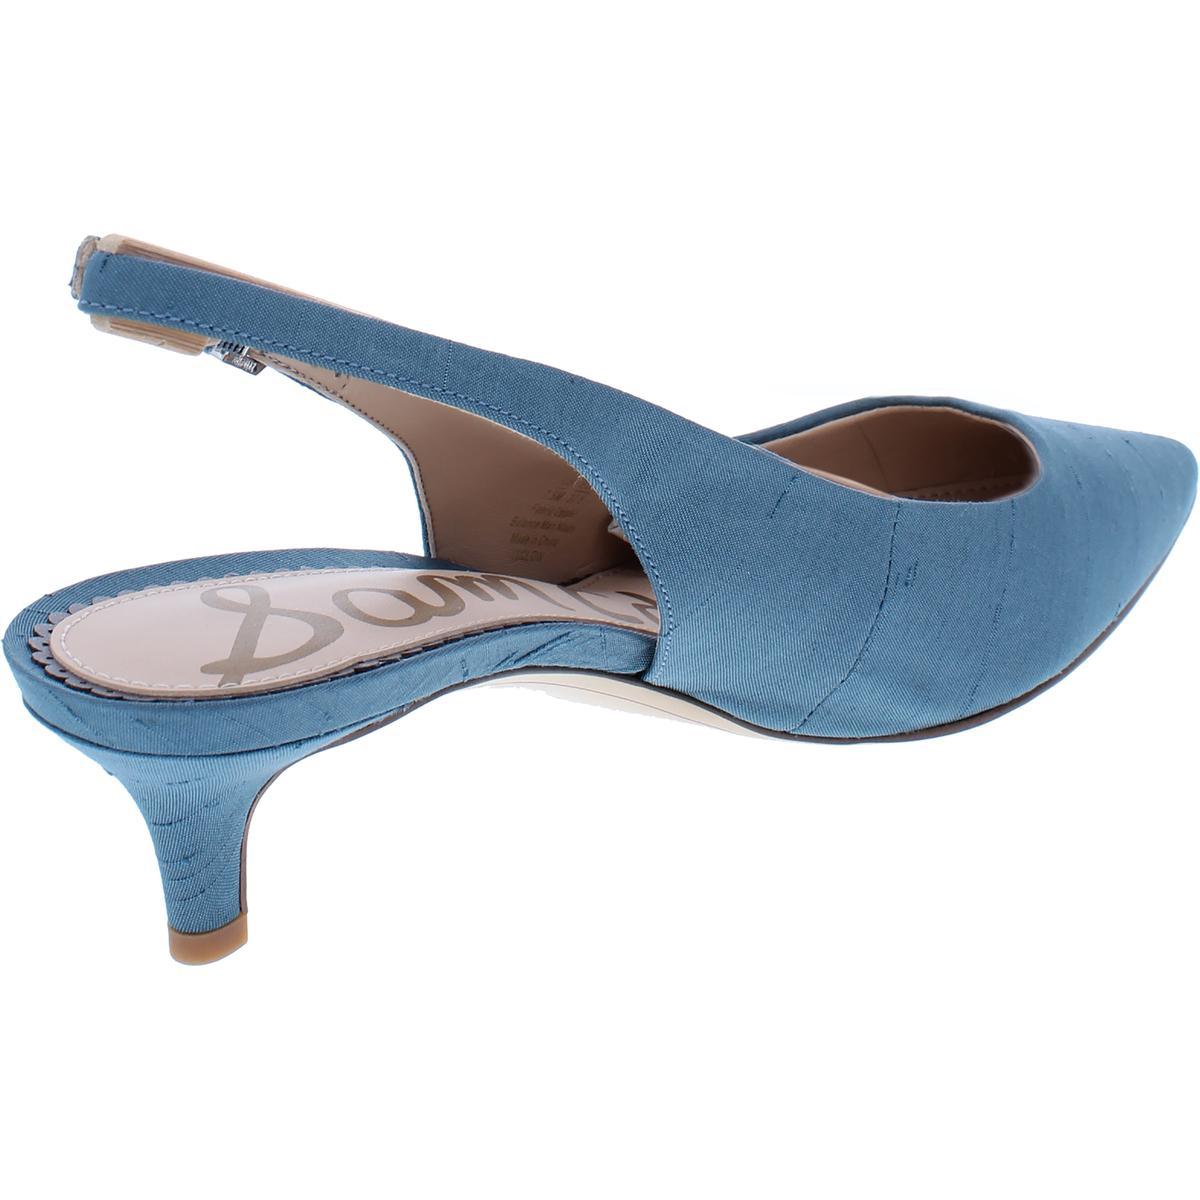 8d670a08676 Sam Edelman Womens Ludlow Blue Slingback HEELS Shoes 8.5 Medium (b M ...